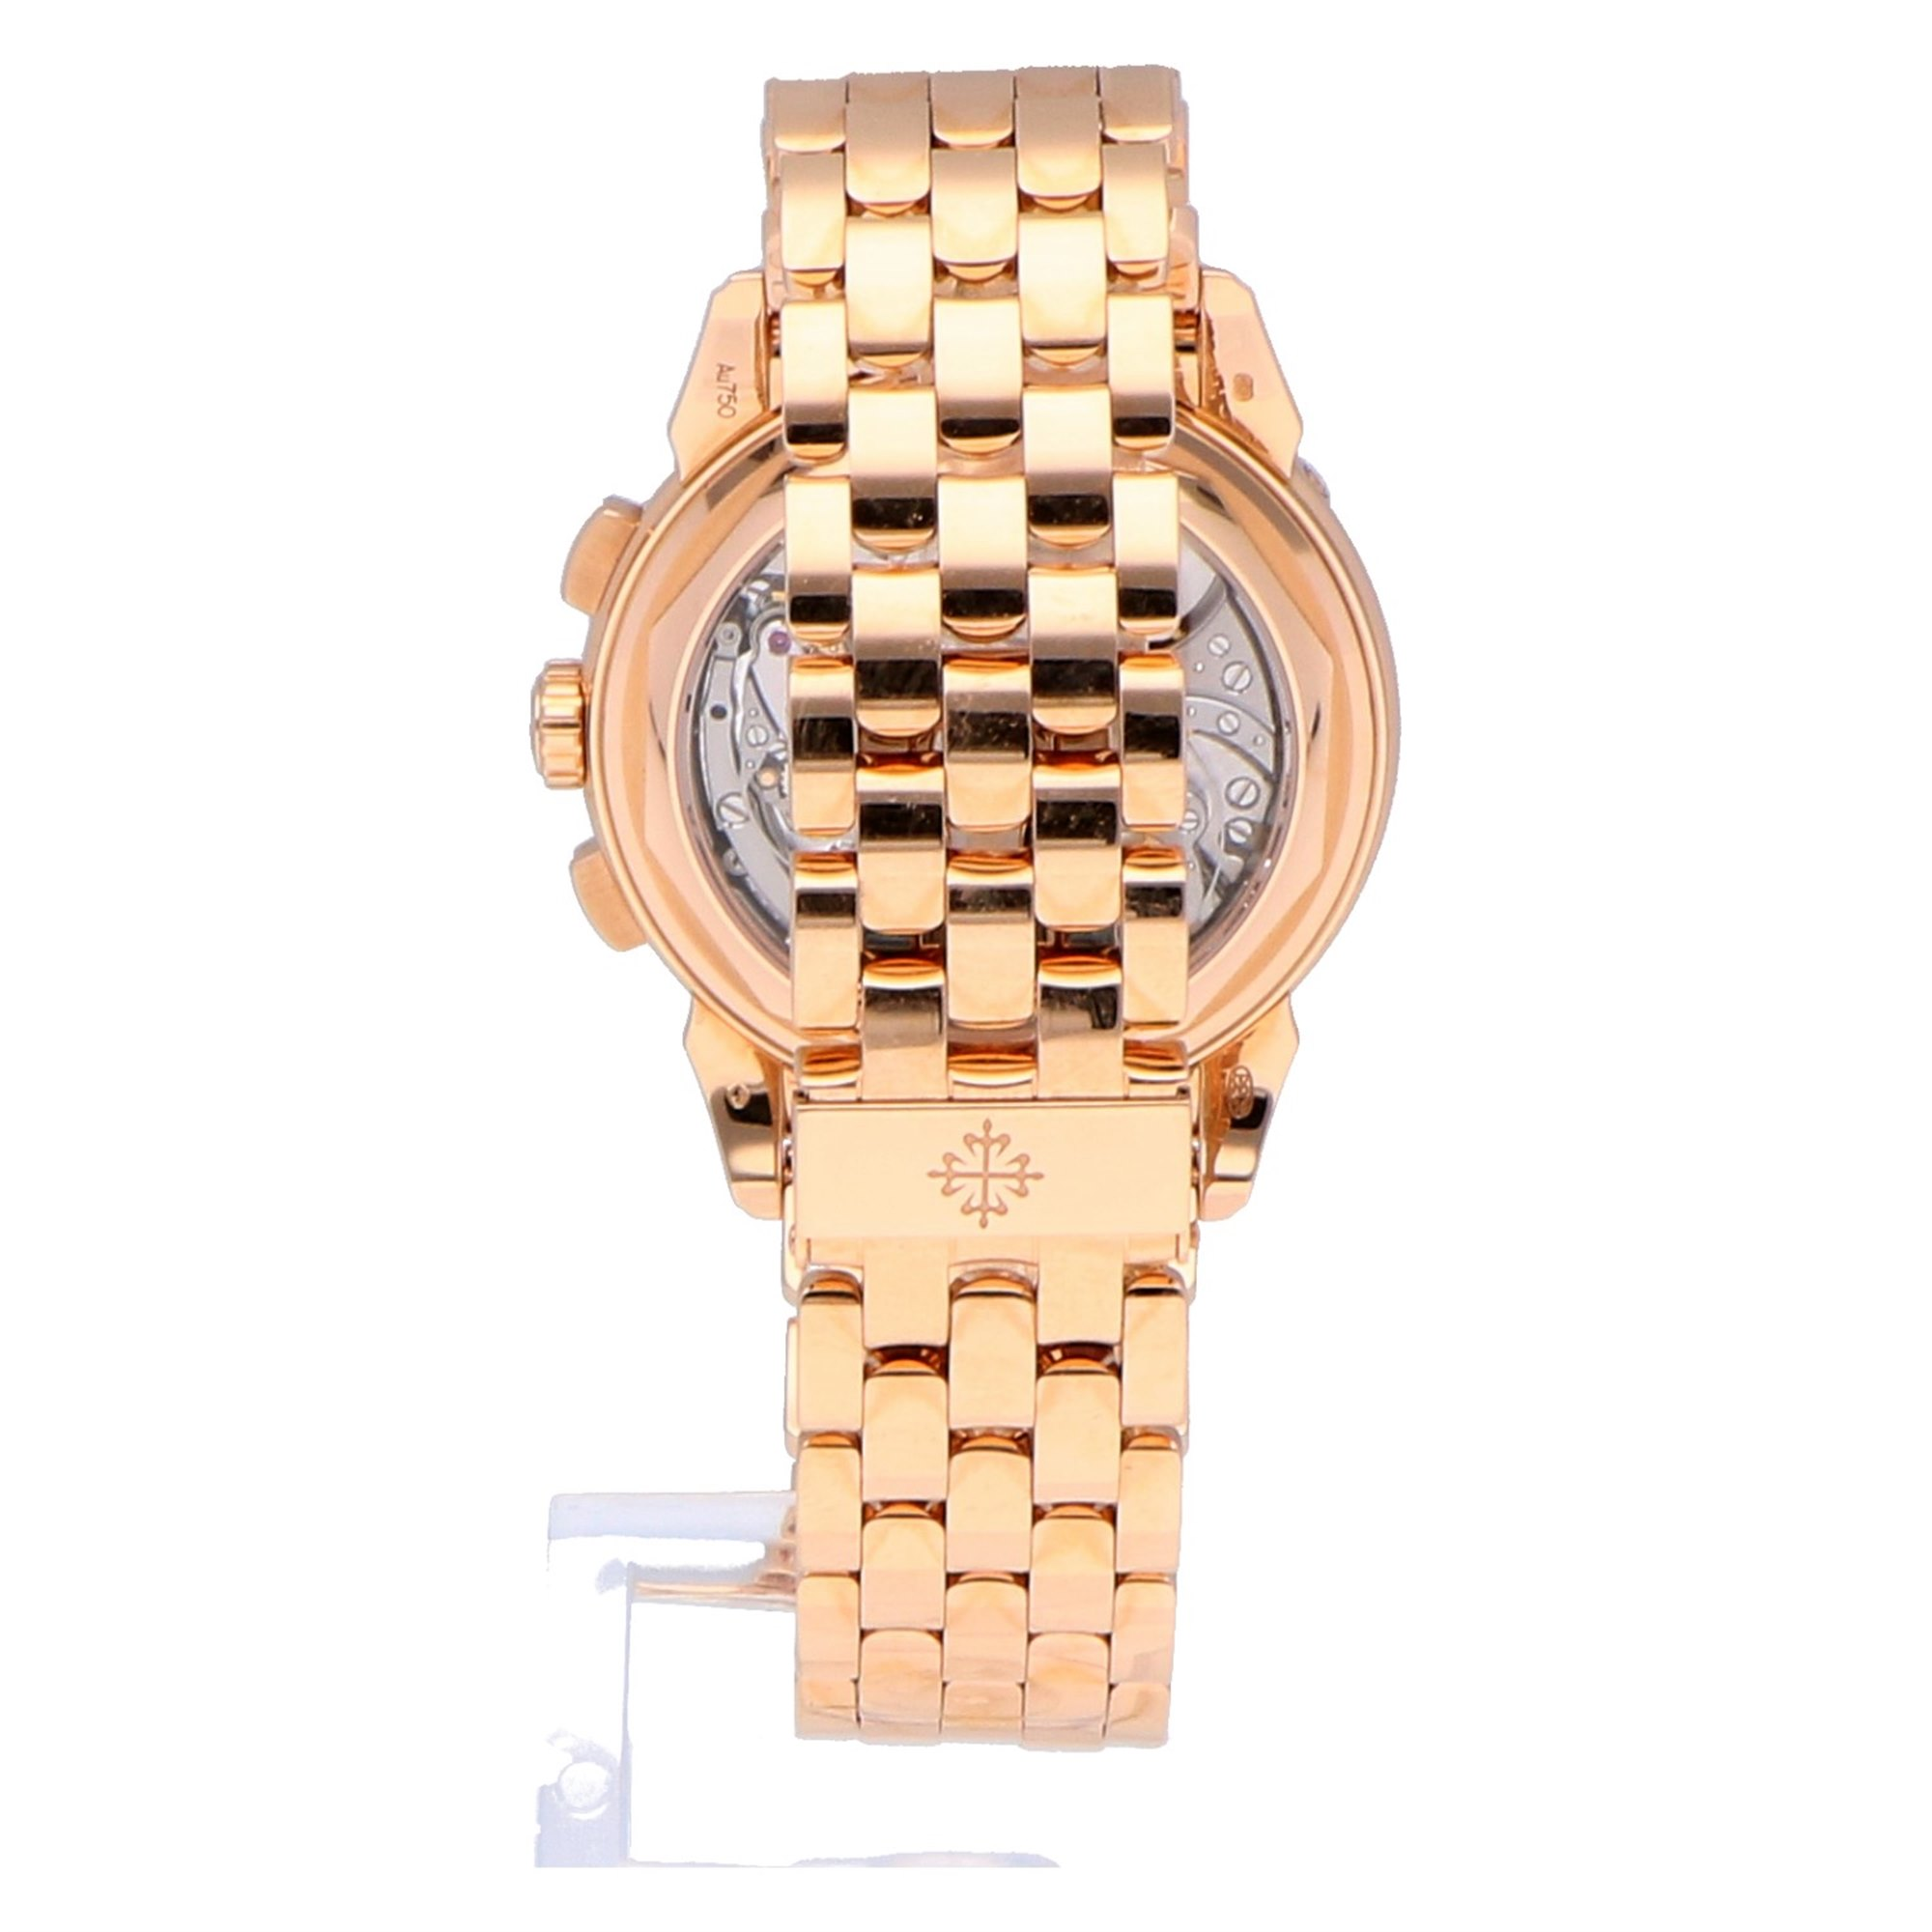 Patek Philippe Grand Complications Perpetual Calendar Chronograph 18k Rose Gold 5270/1R-001